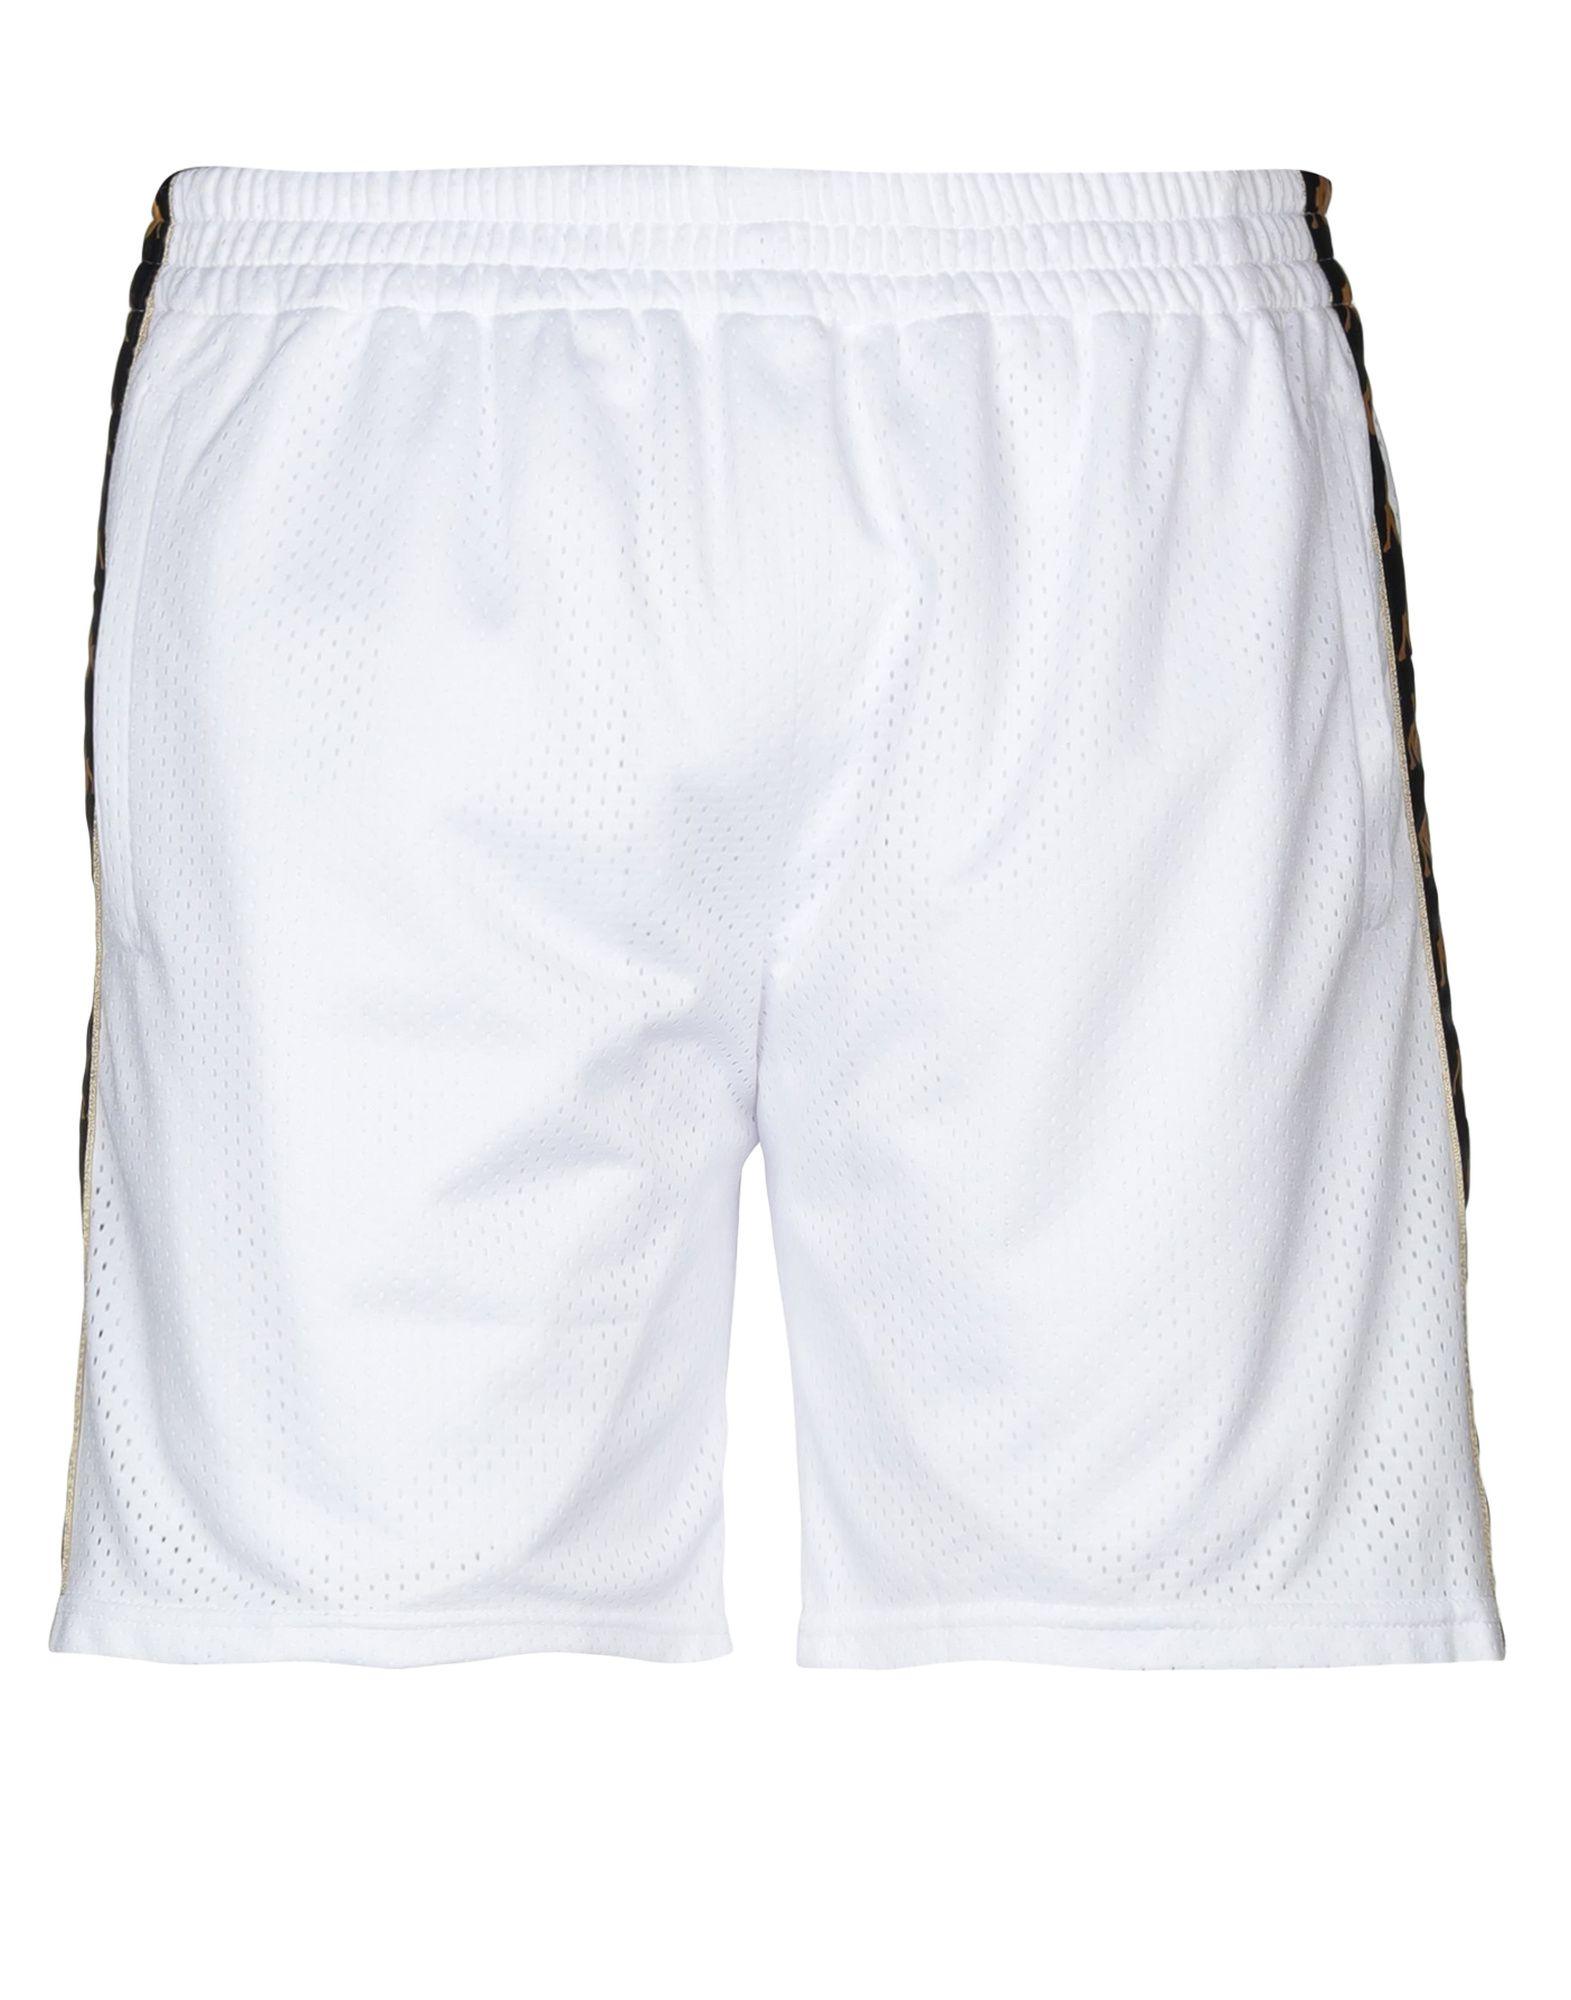 KAPPA x FAITH CONNEXION Повседневные шорты шорты спортивные kappa kappa ka039emifkr1